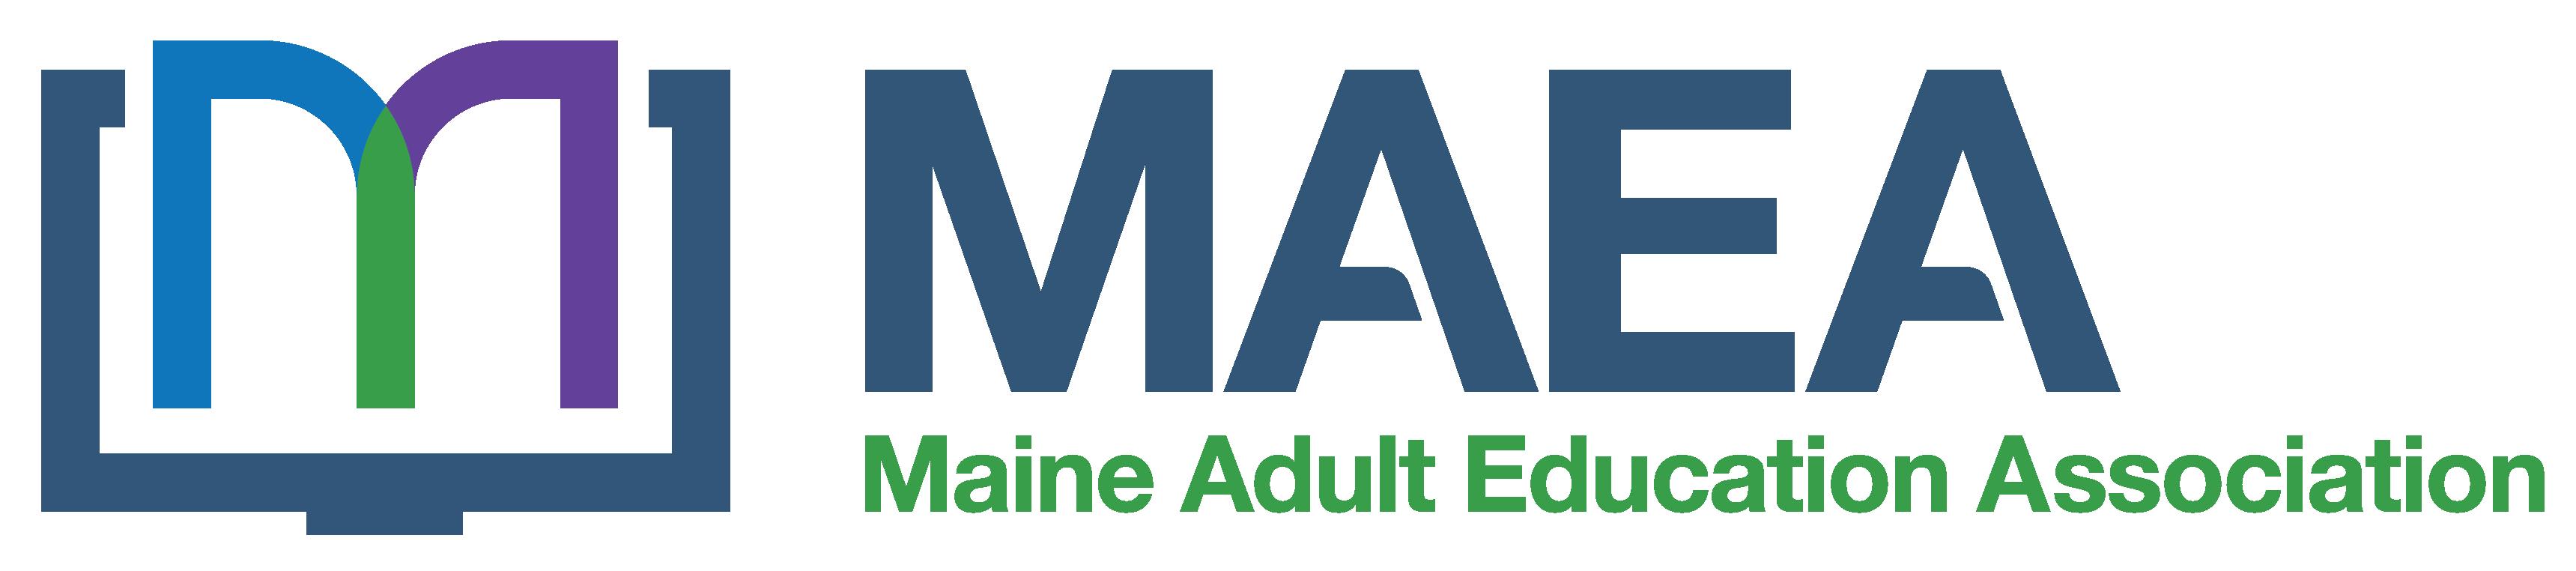 Maine Adult Education Association Logo